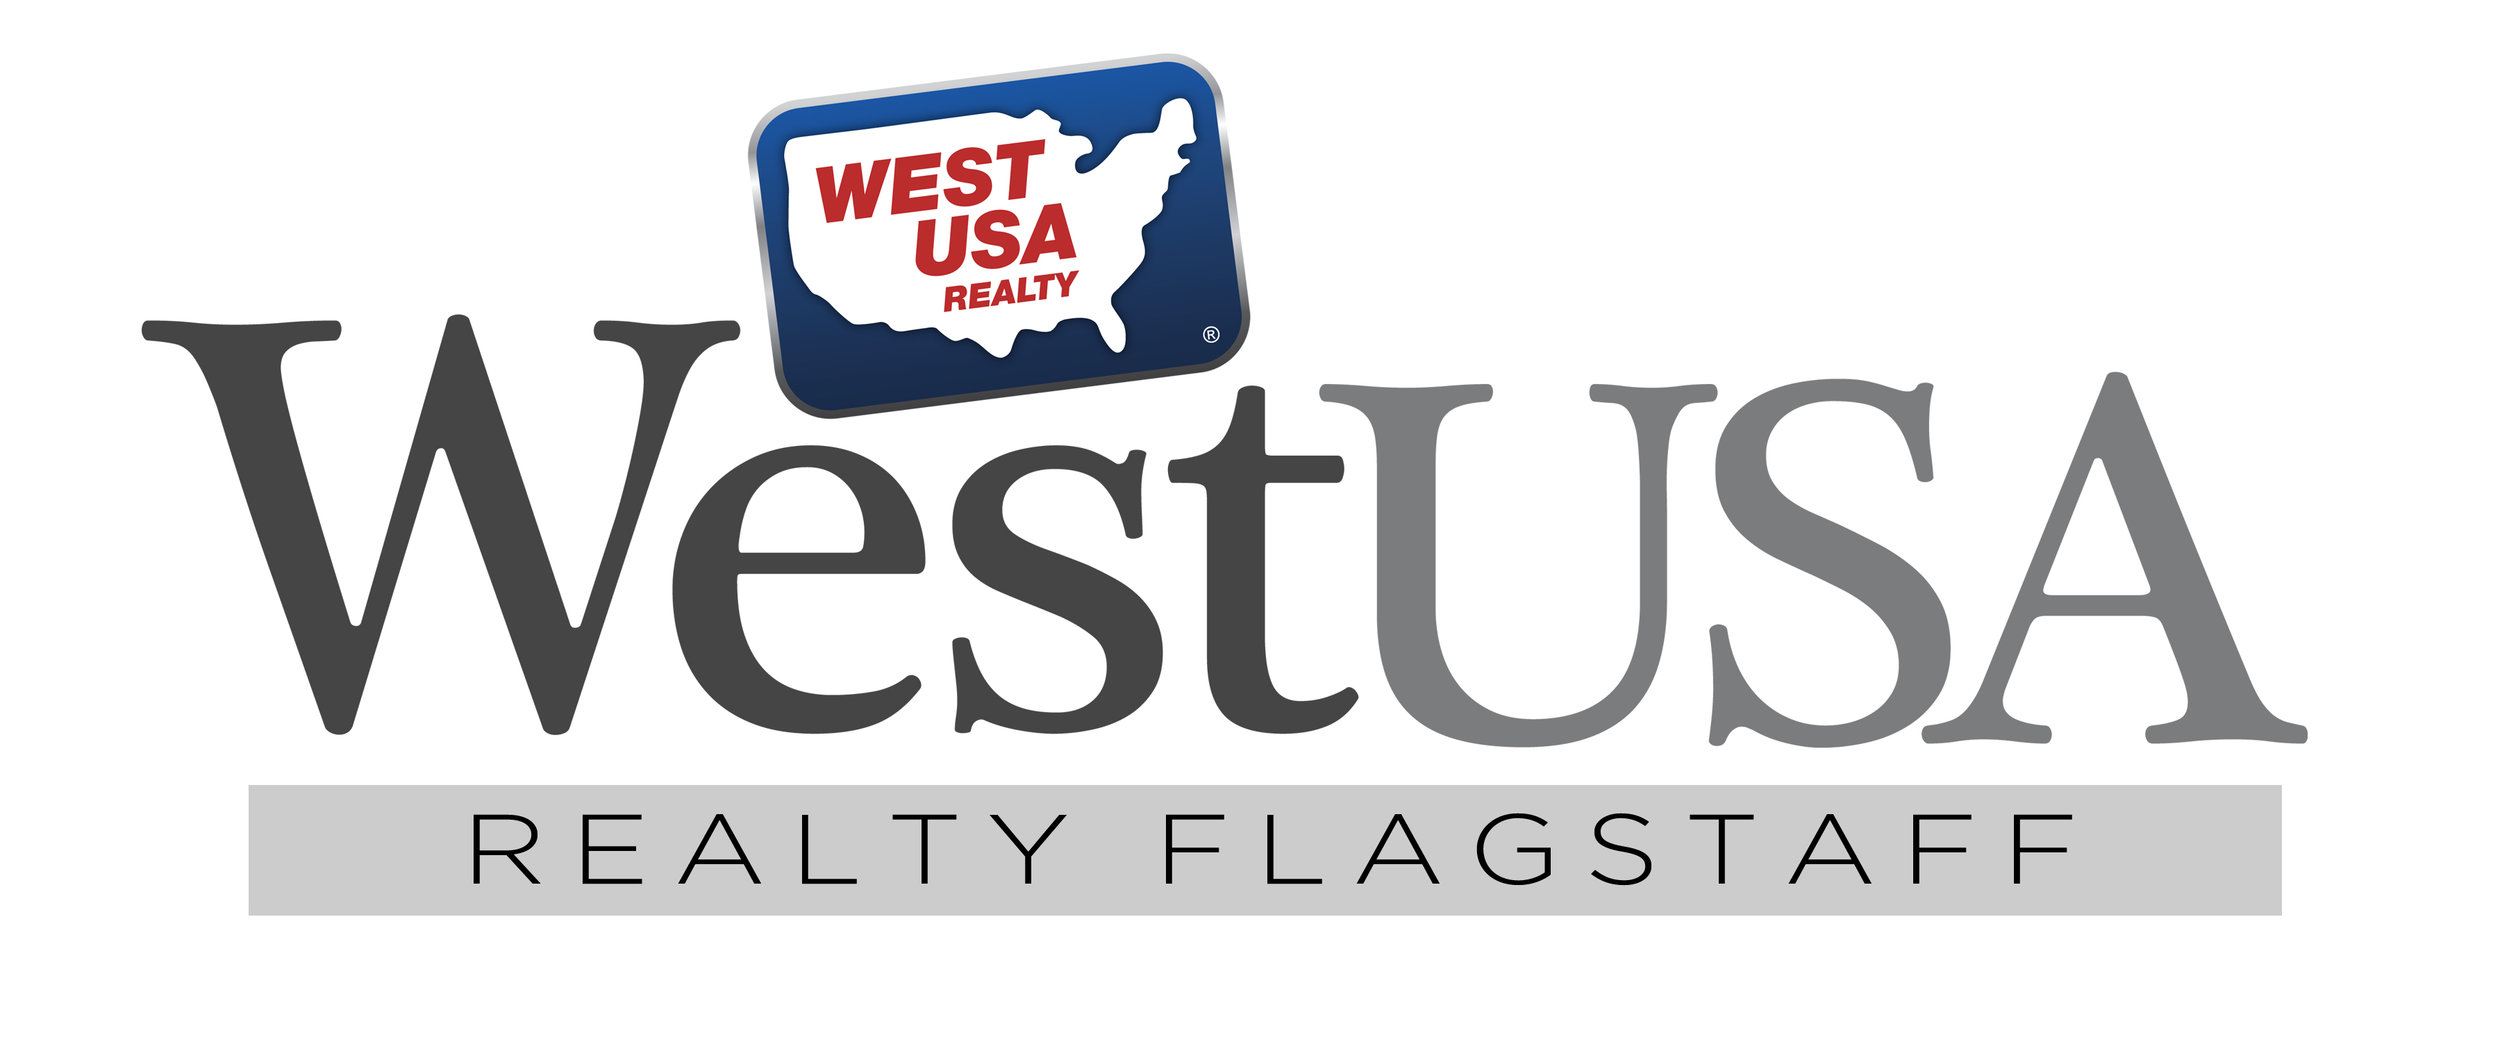 WestUSA.jpg